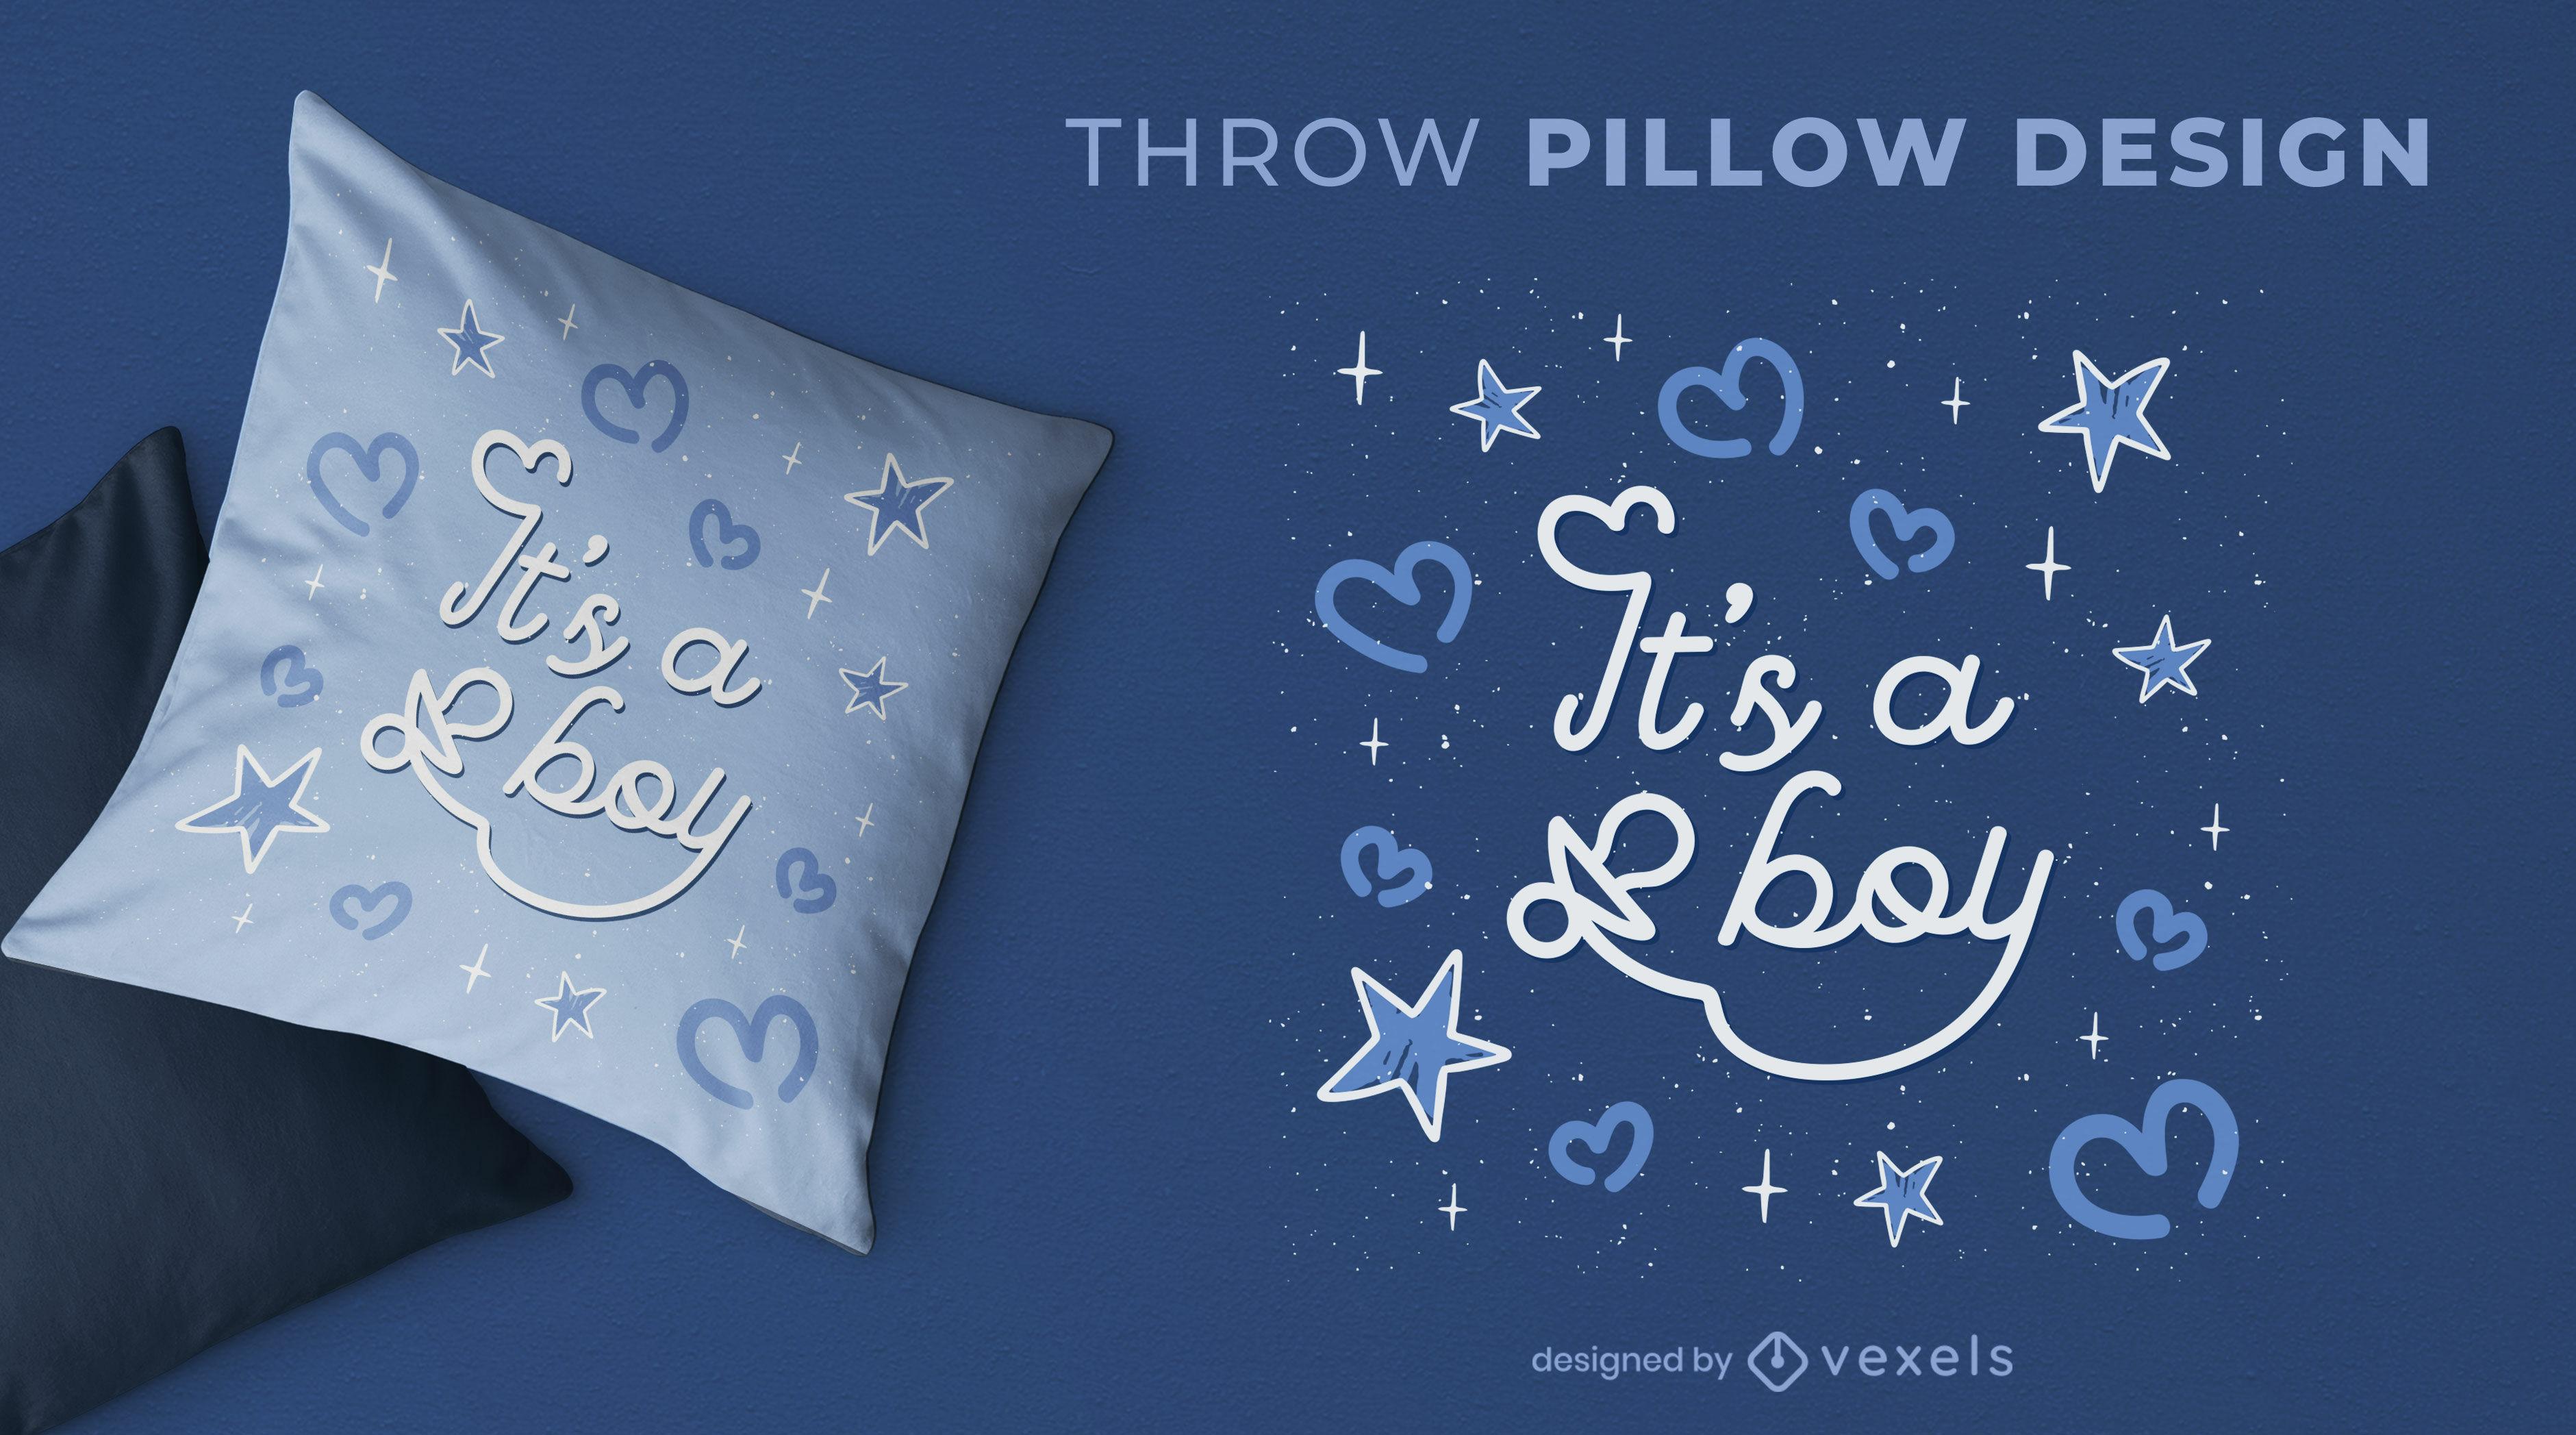 Baby boy gender reveal throw pillow design